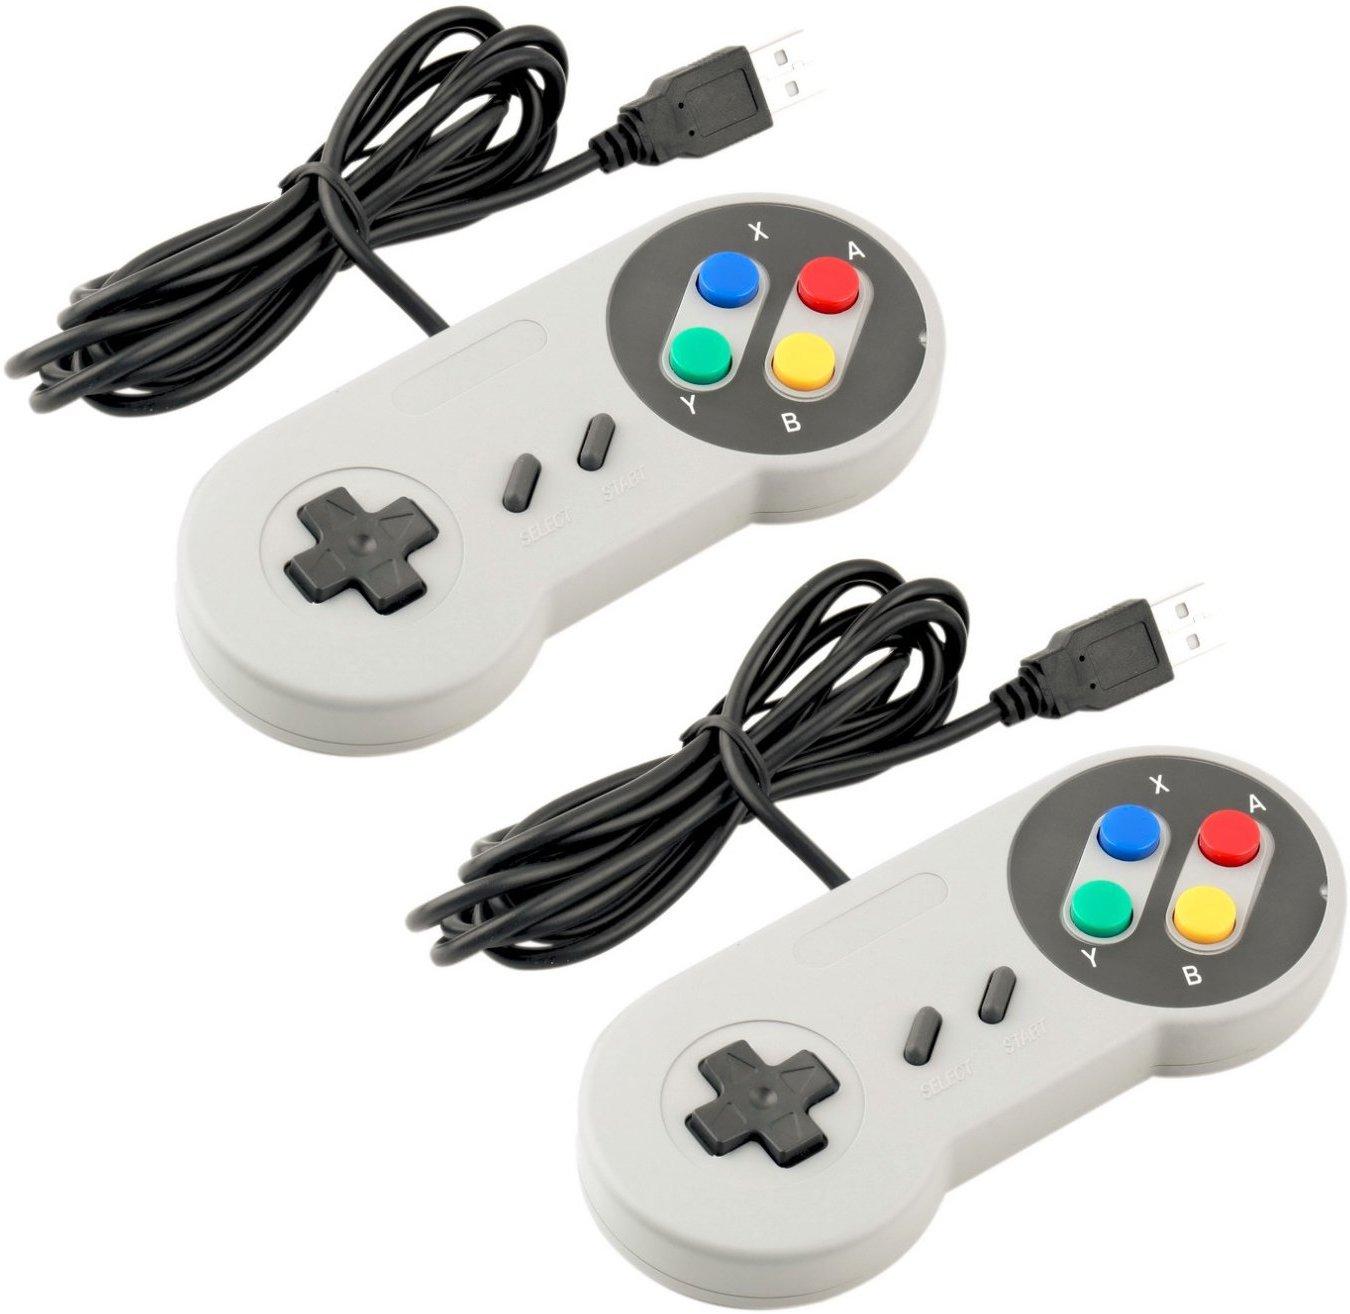 Súper juego controlador SNES USB Classic Gamepad [paquete de 2] para juegos PC MAC para Win98/ME/2000/2003/XP/Vista/Windows7/8/ Mac os